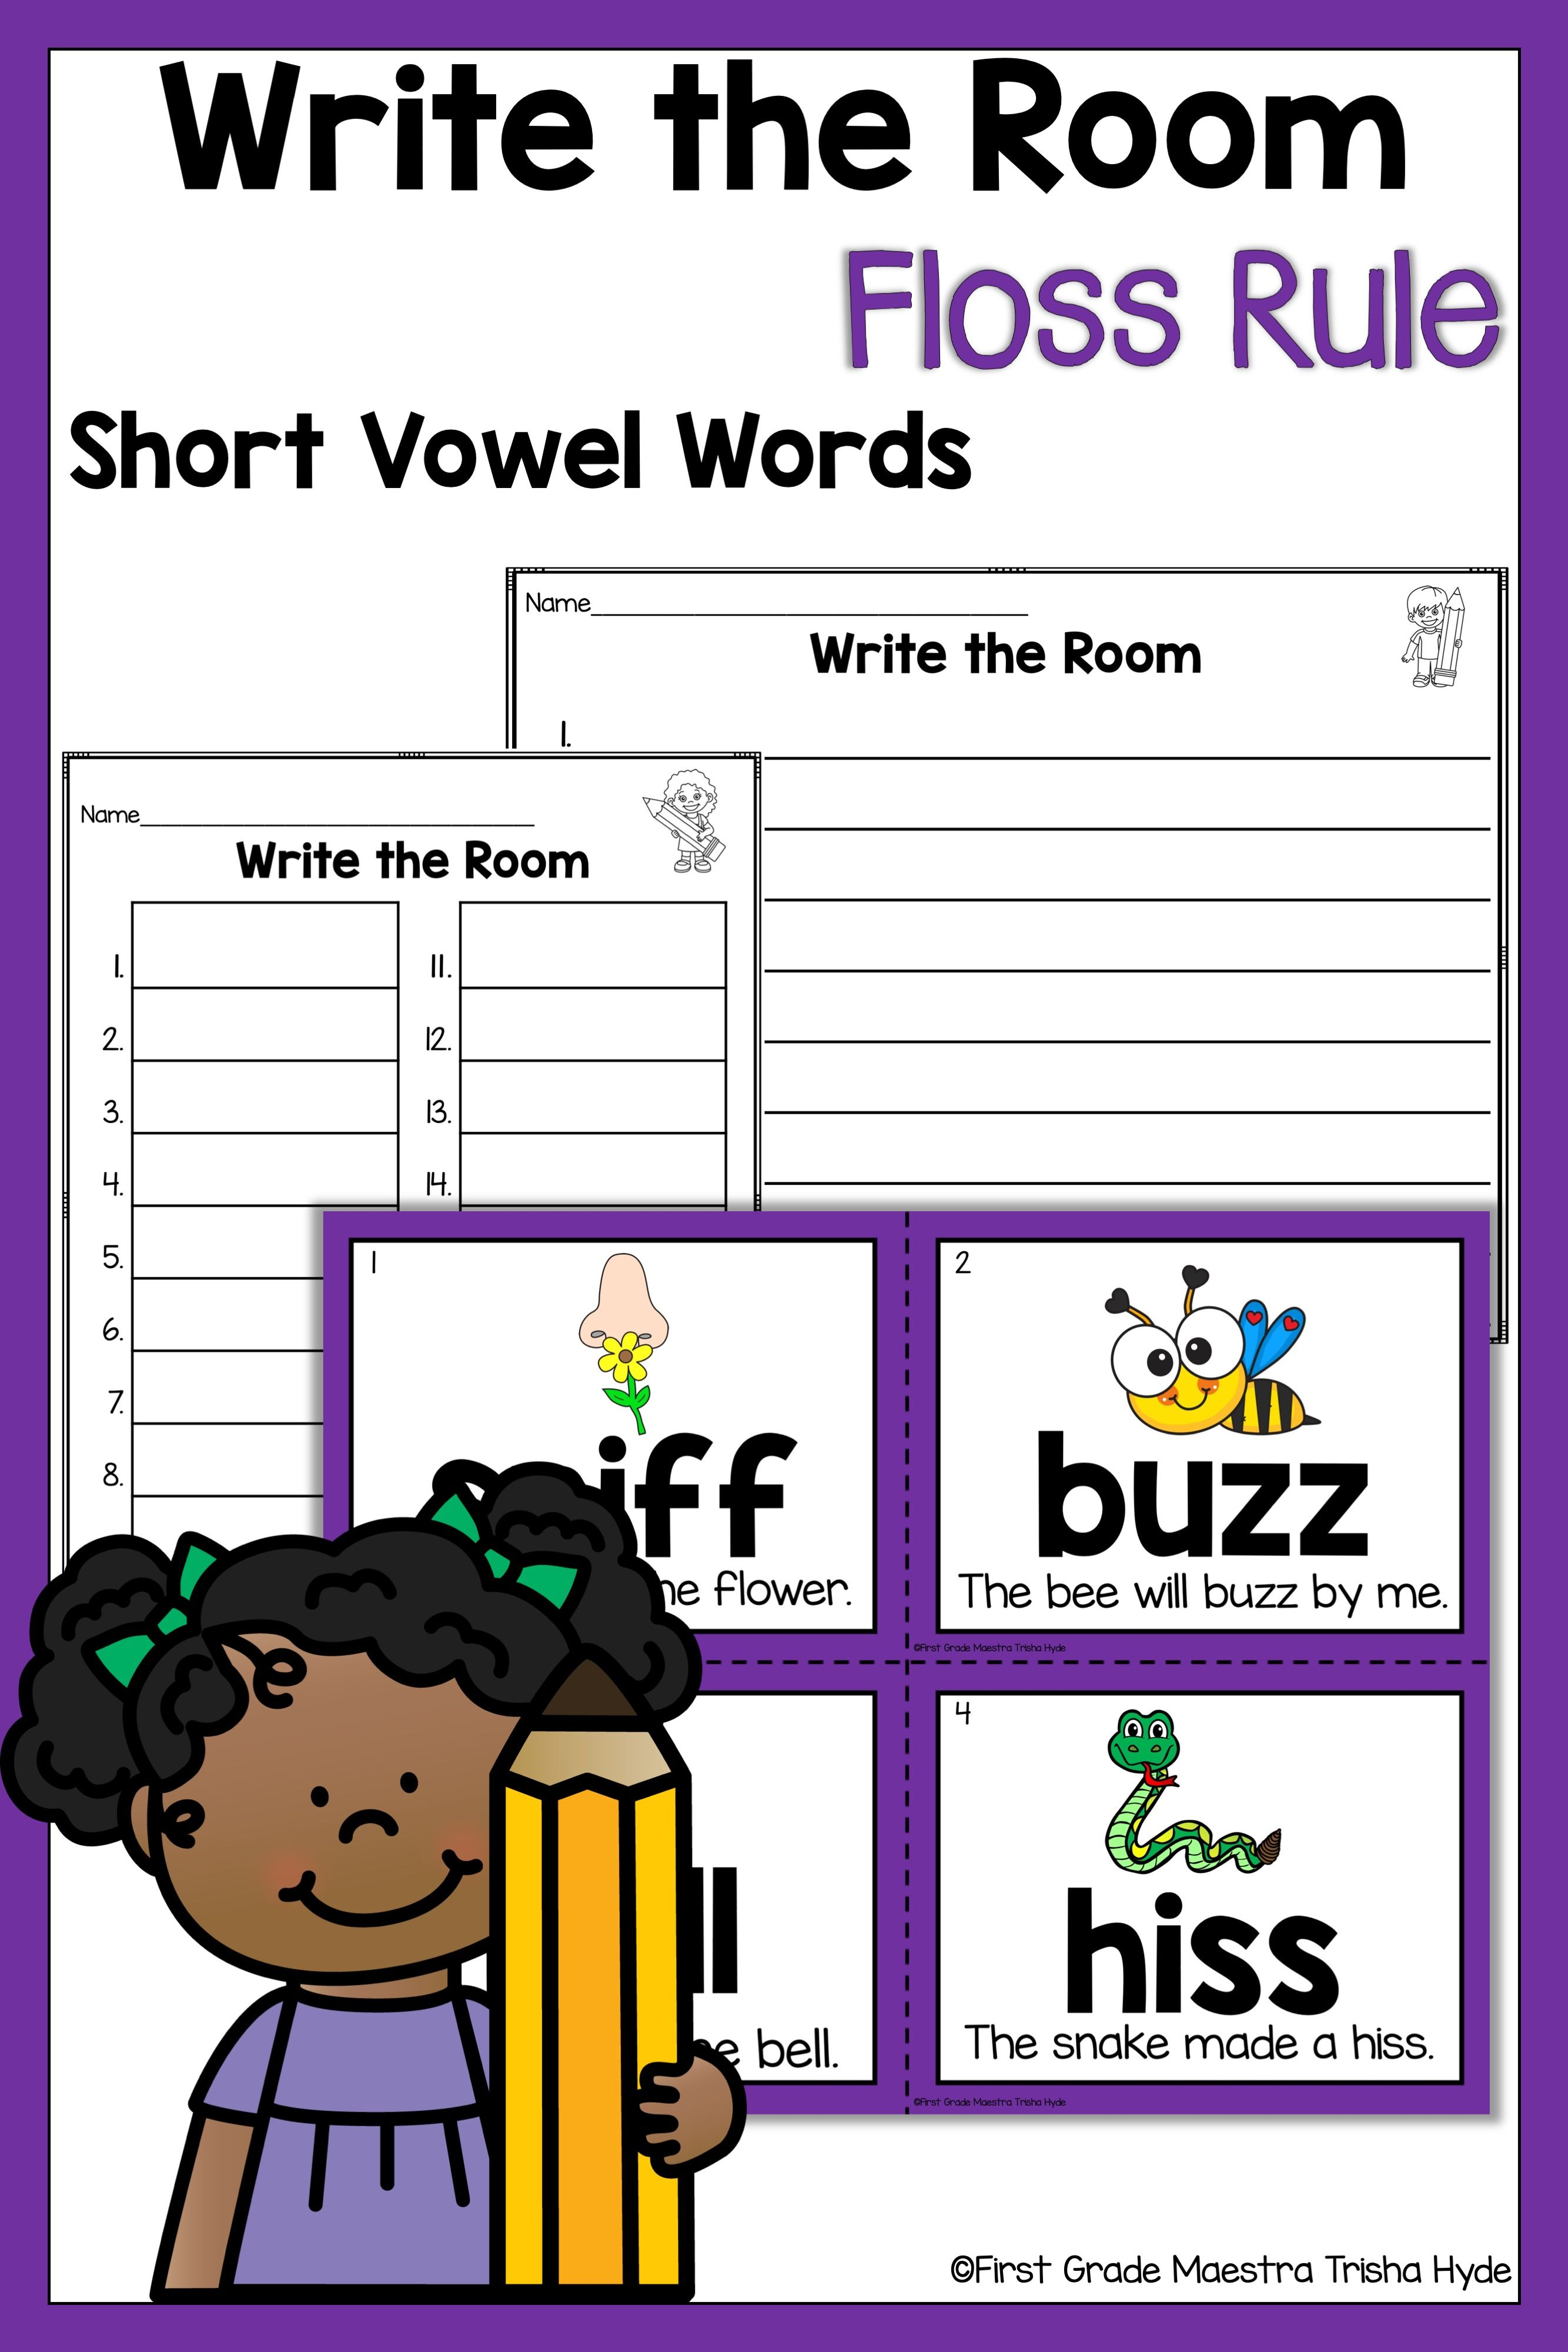 Write The Room Floss Rule